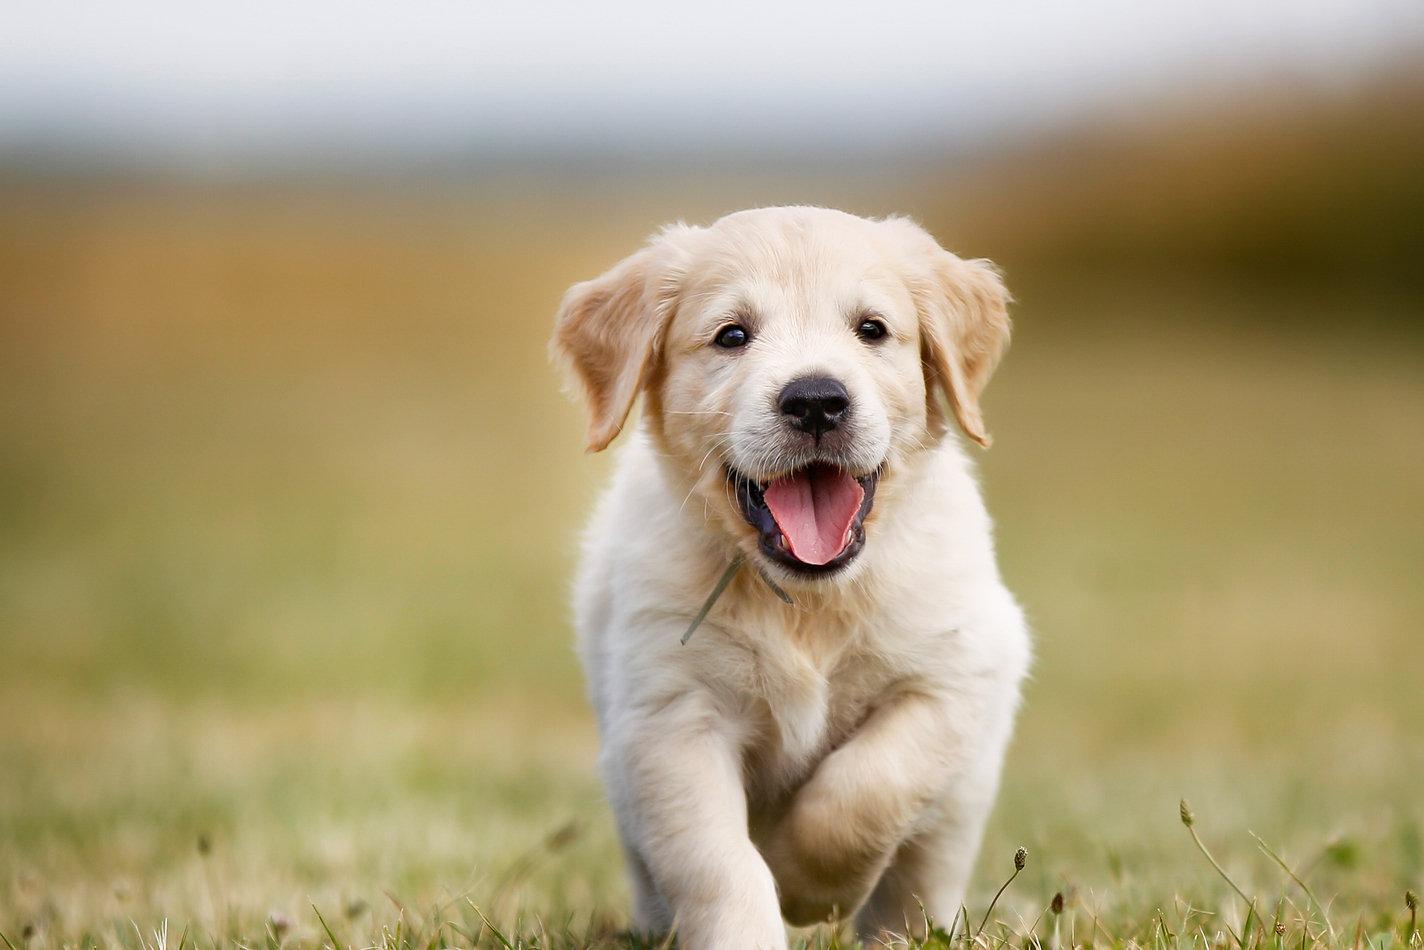 Cachorros: Roer, Adaptar, Socializar